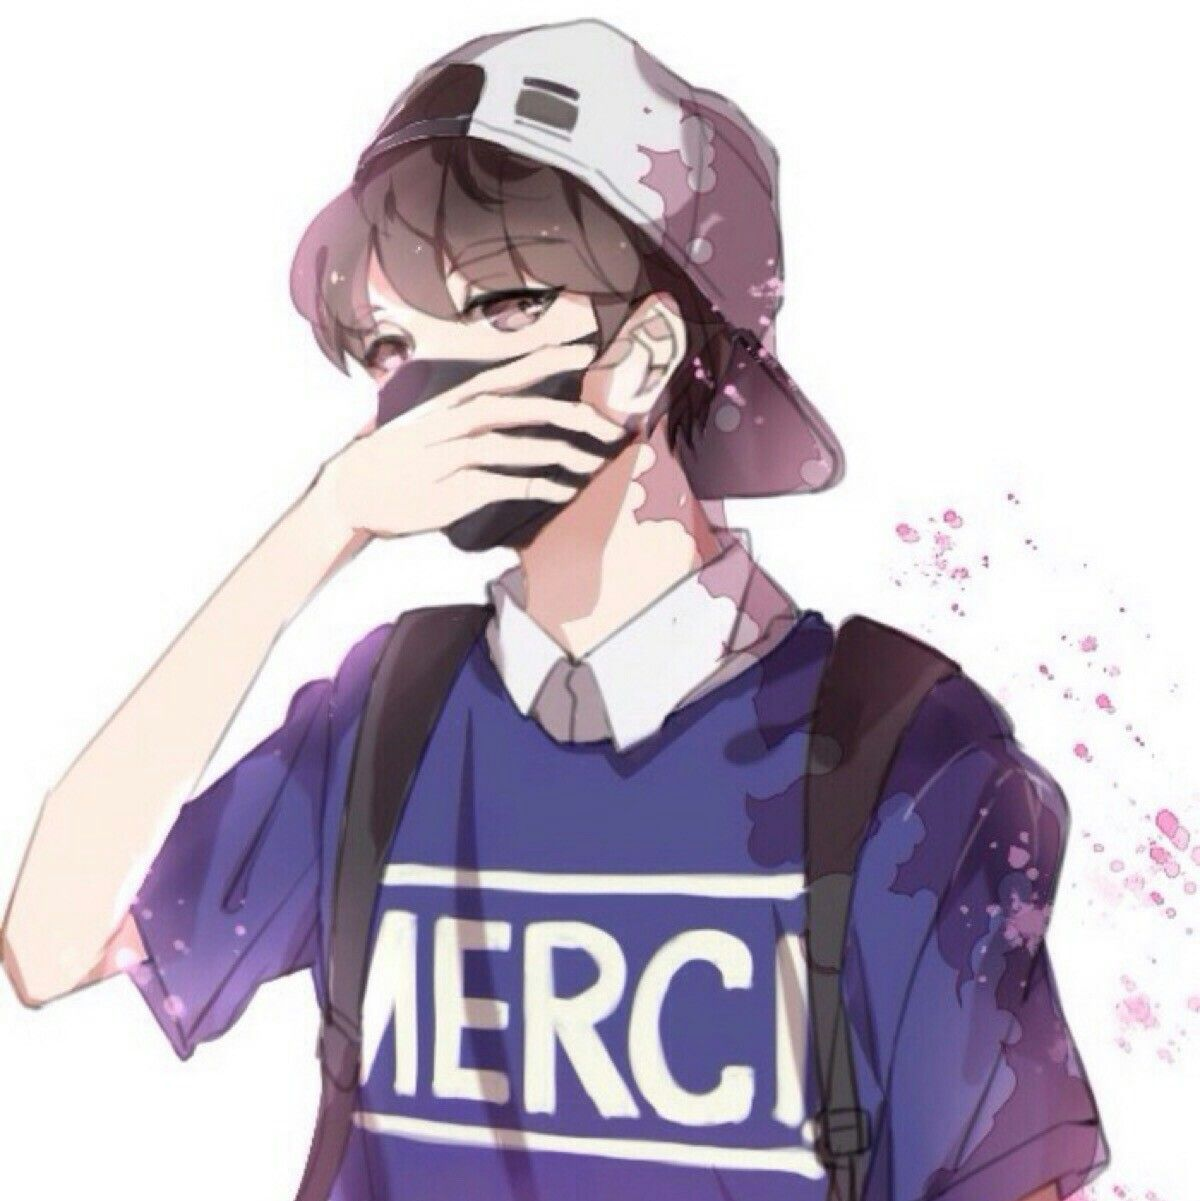 Pin Oleh Sick Boy Di Anime Guys Dengan Gambar Gambar Karakter Animasi